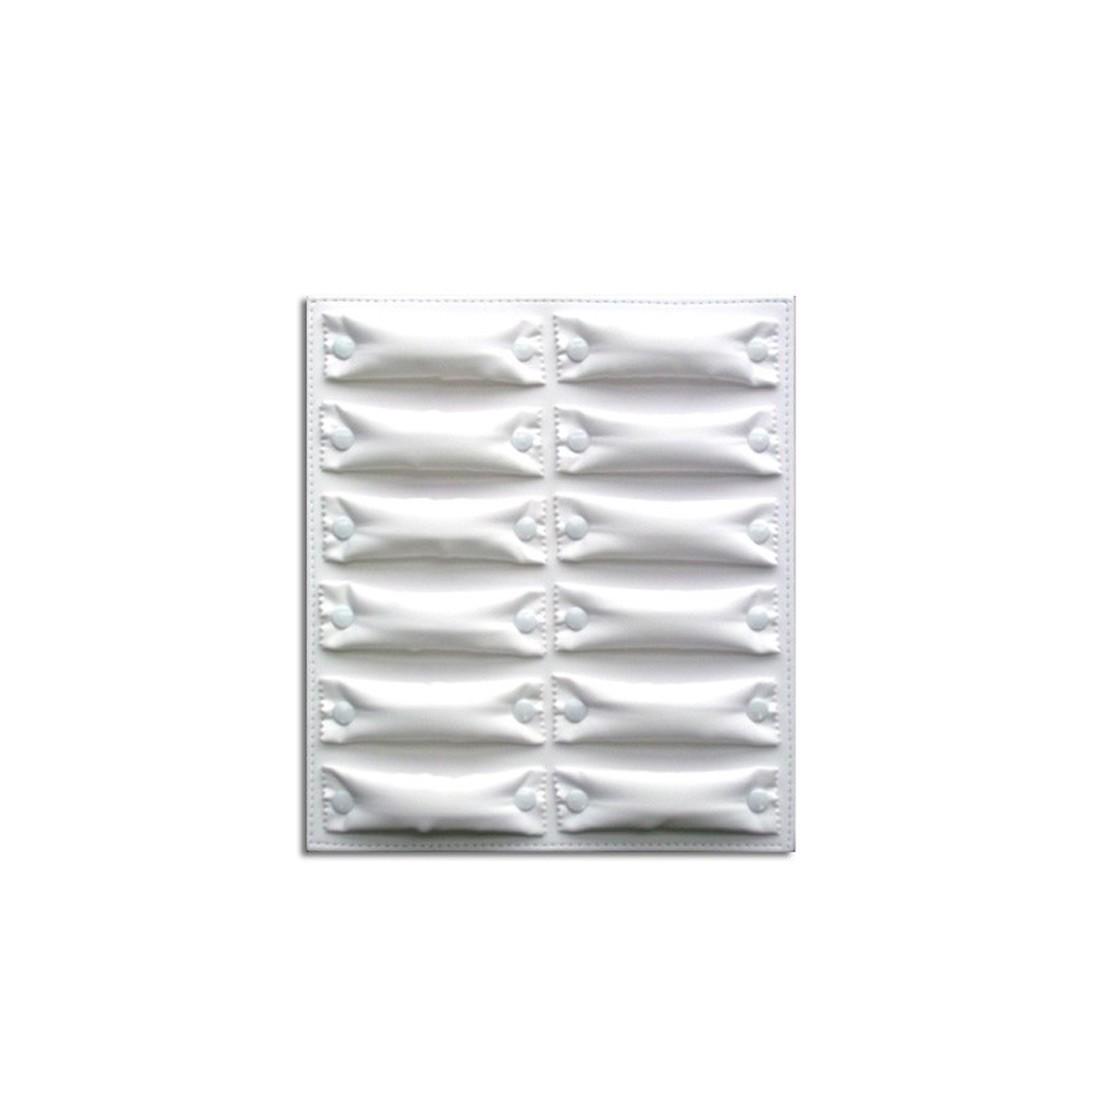 Bases jewelry sampler - 12 half rolls for rings